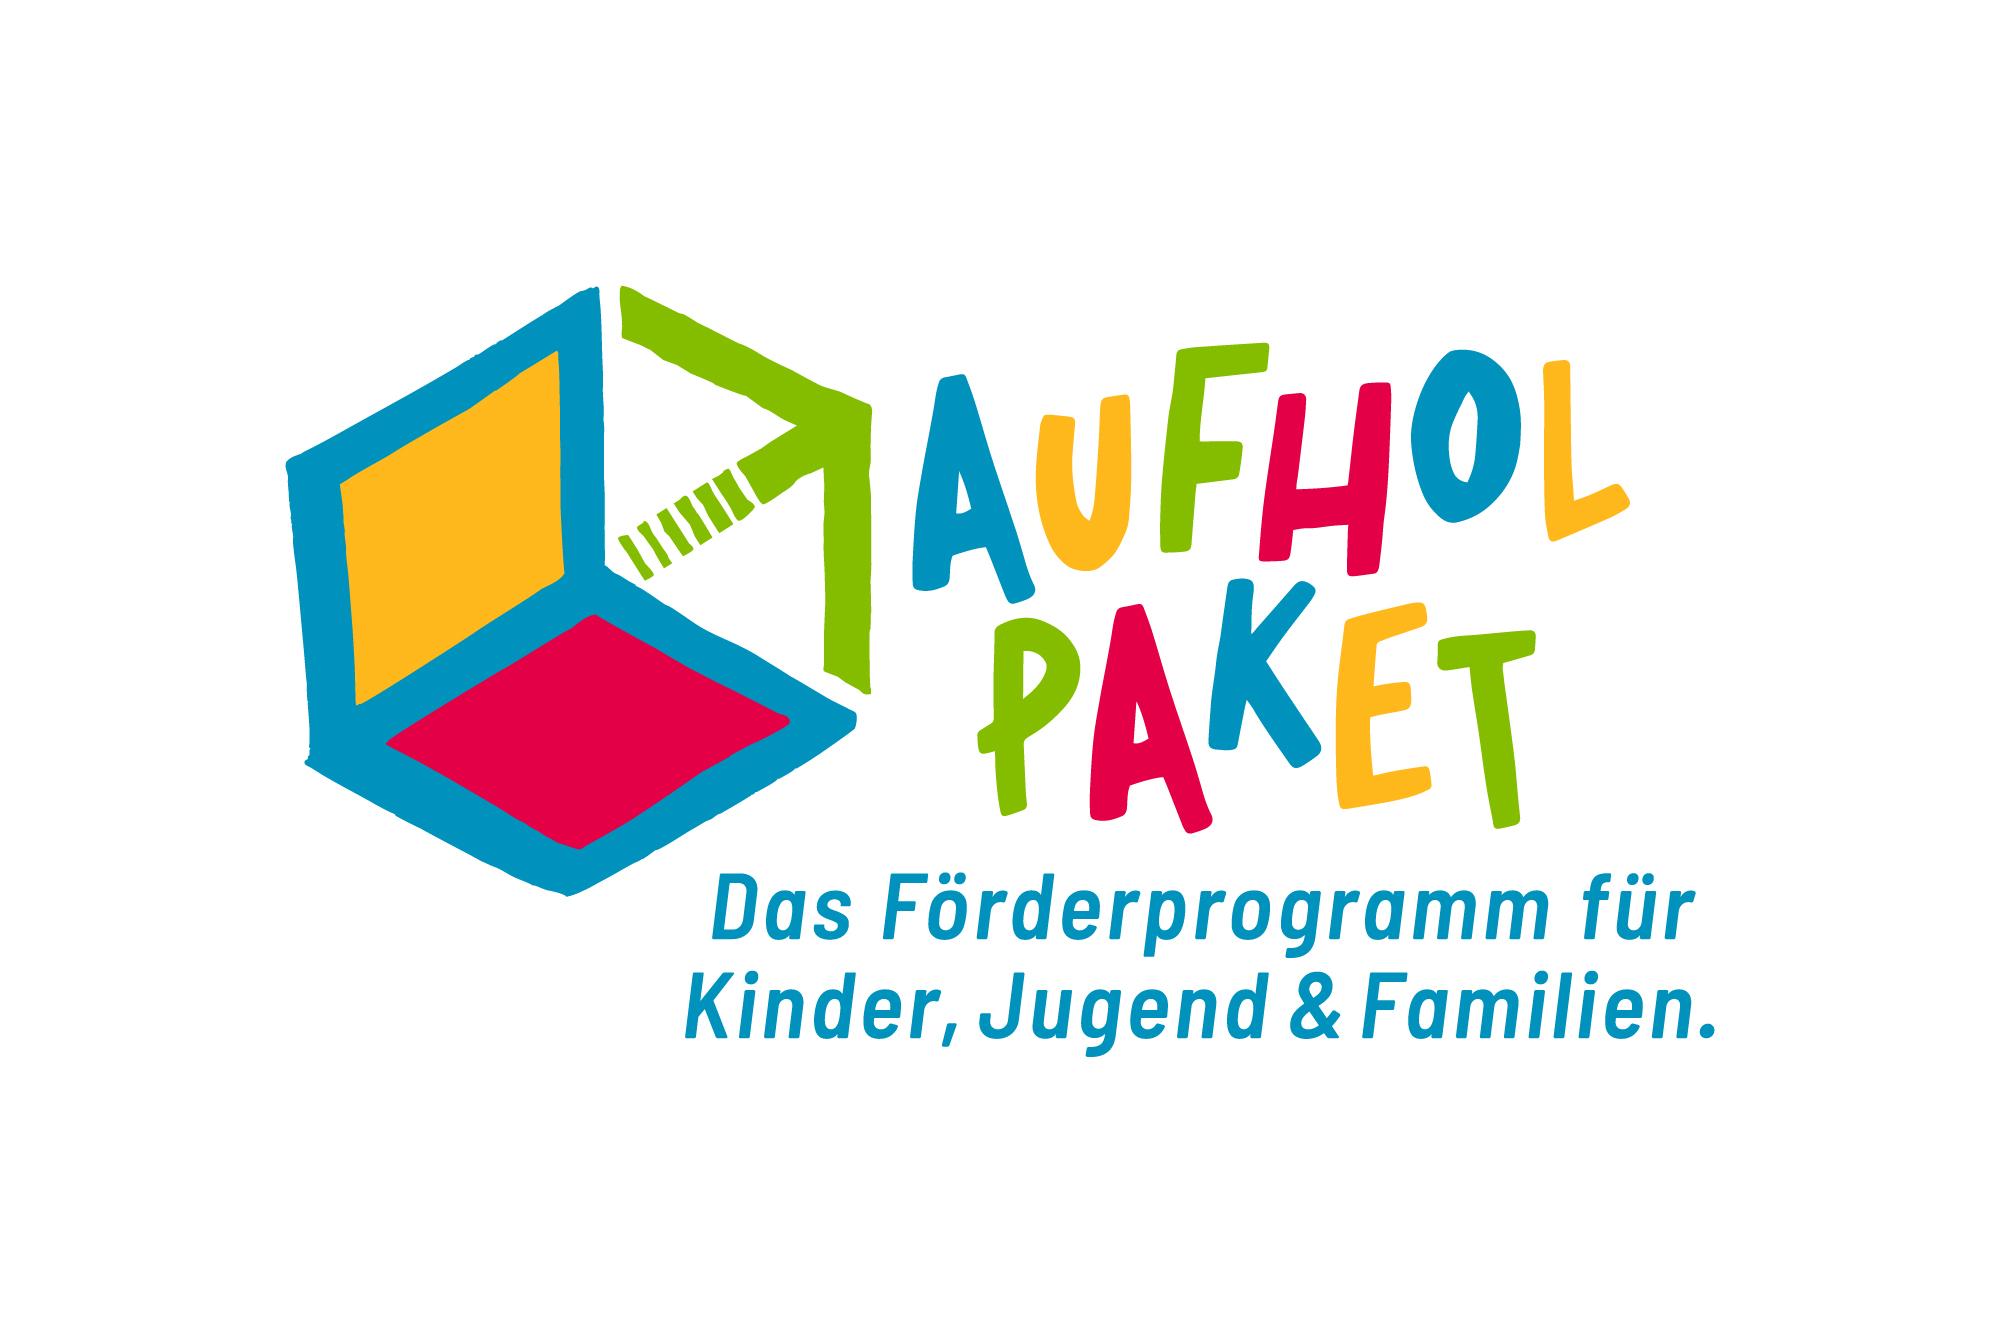 10 Logo_Aufholpaket